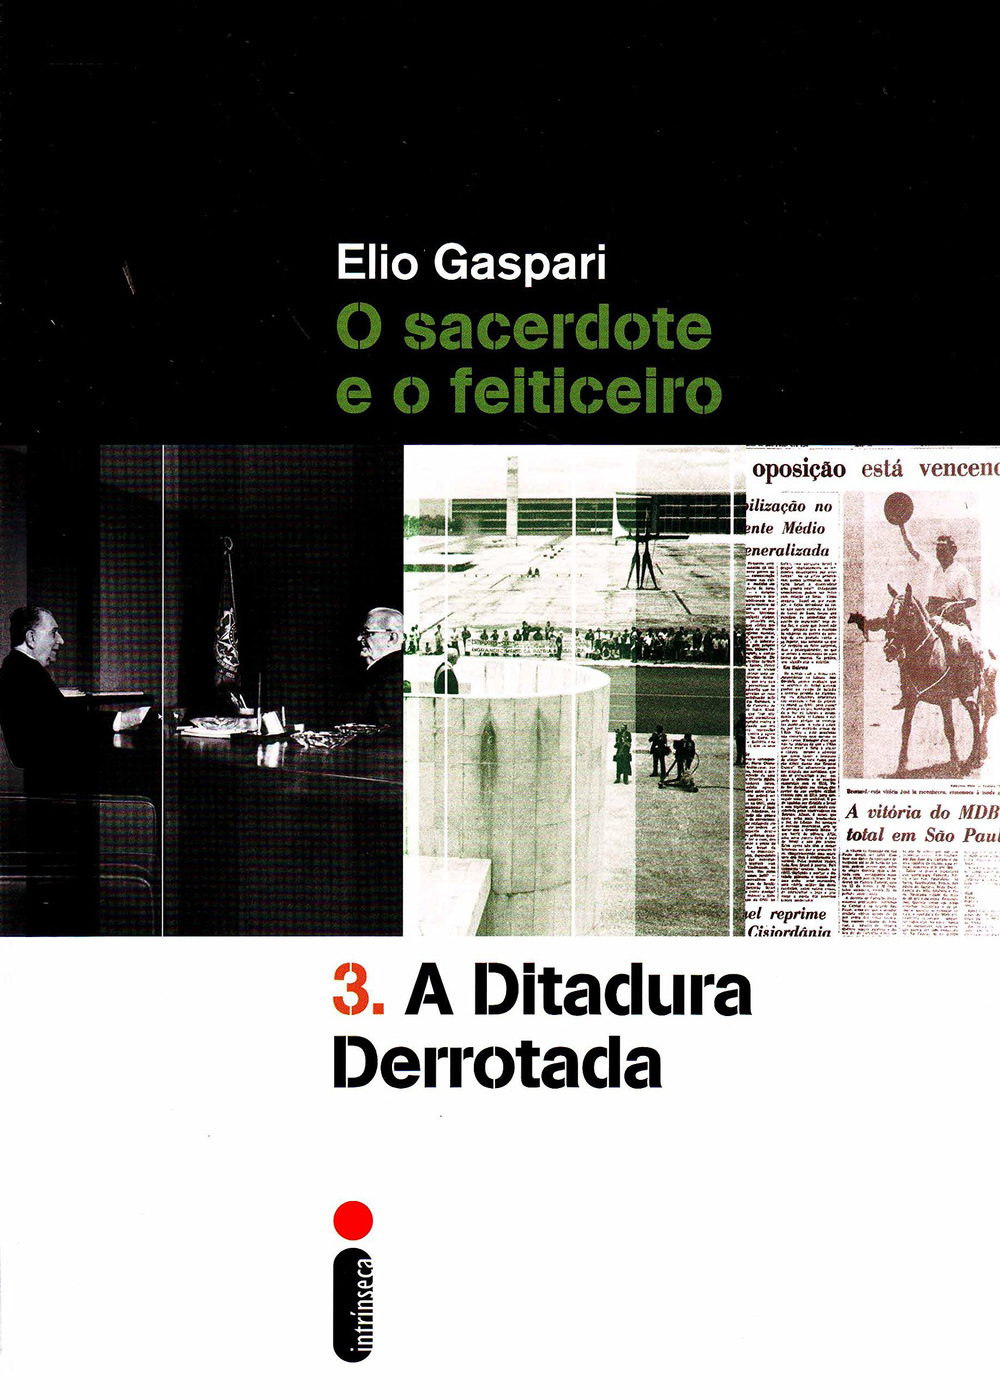 Gaspari, Elio - Ditadura Derrotada.jpg